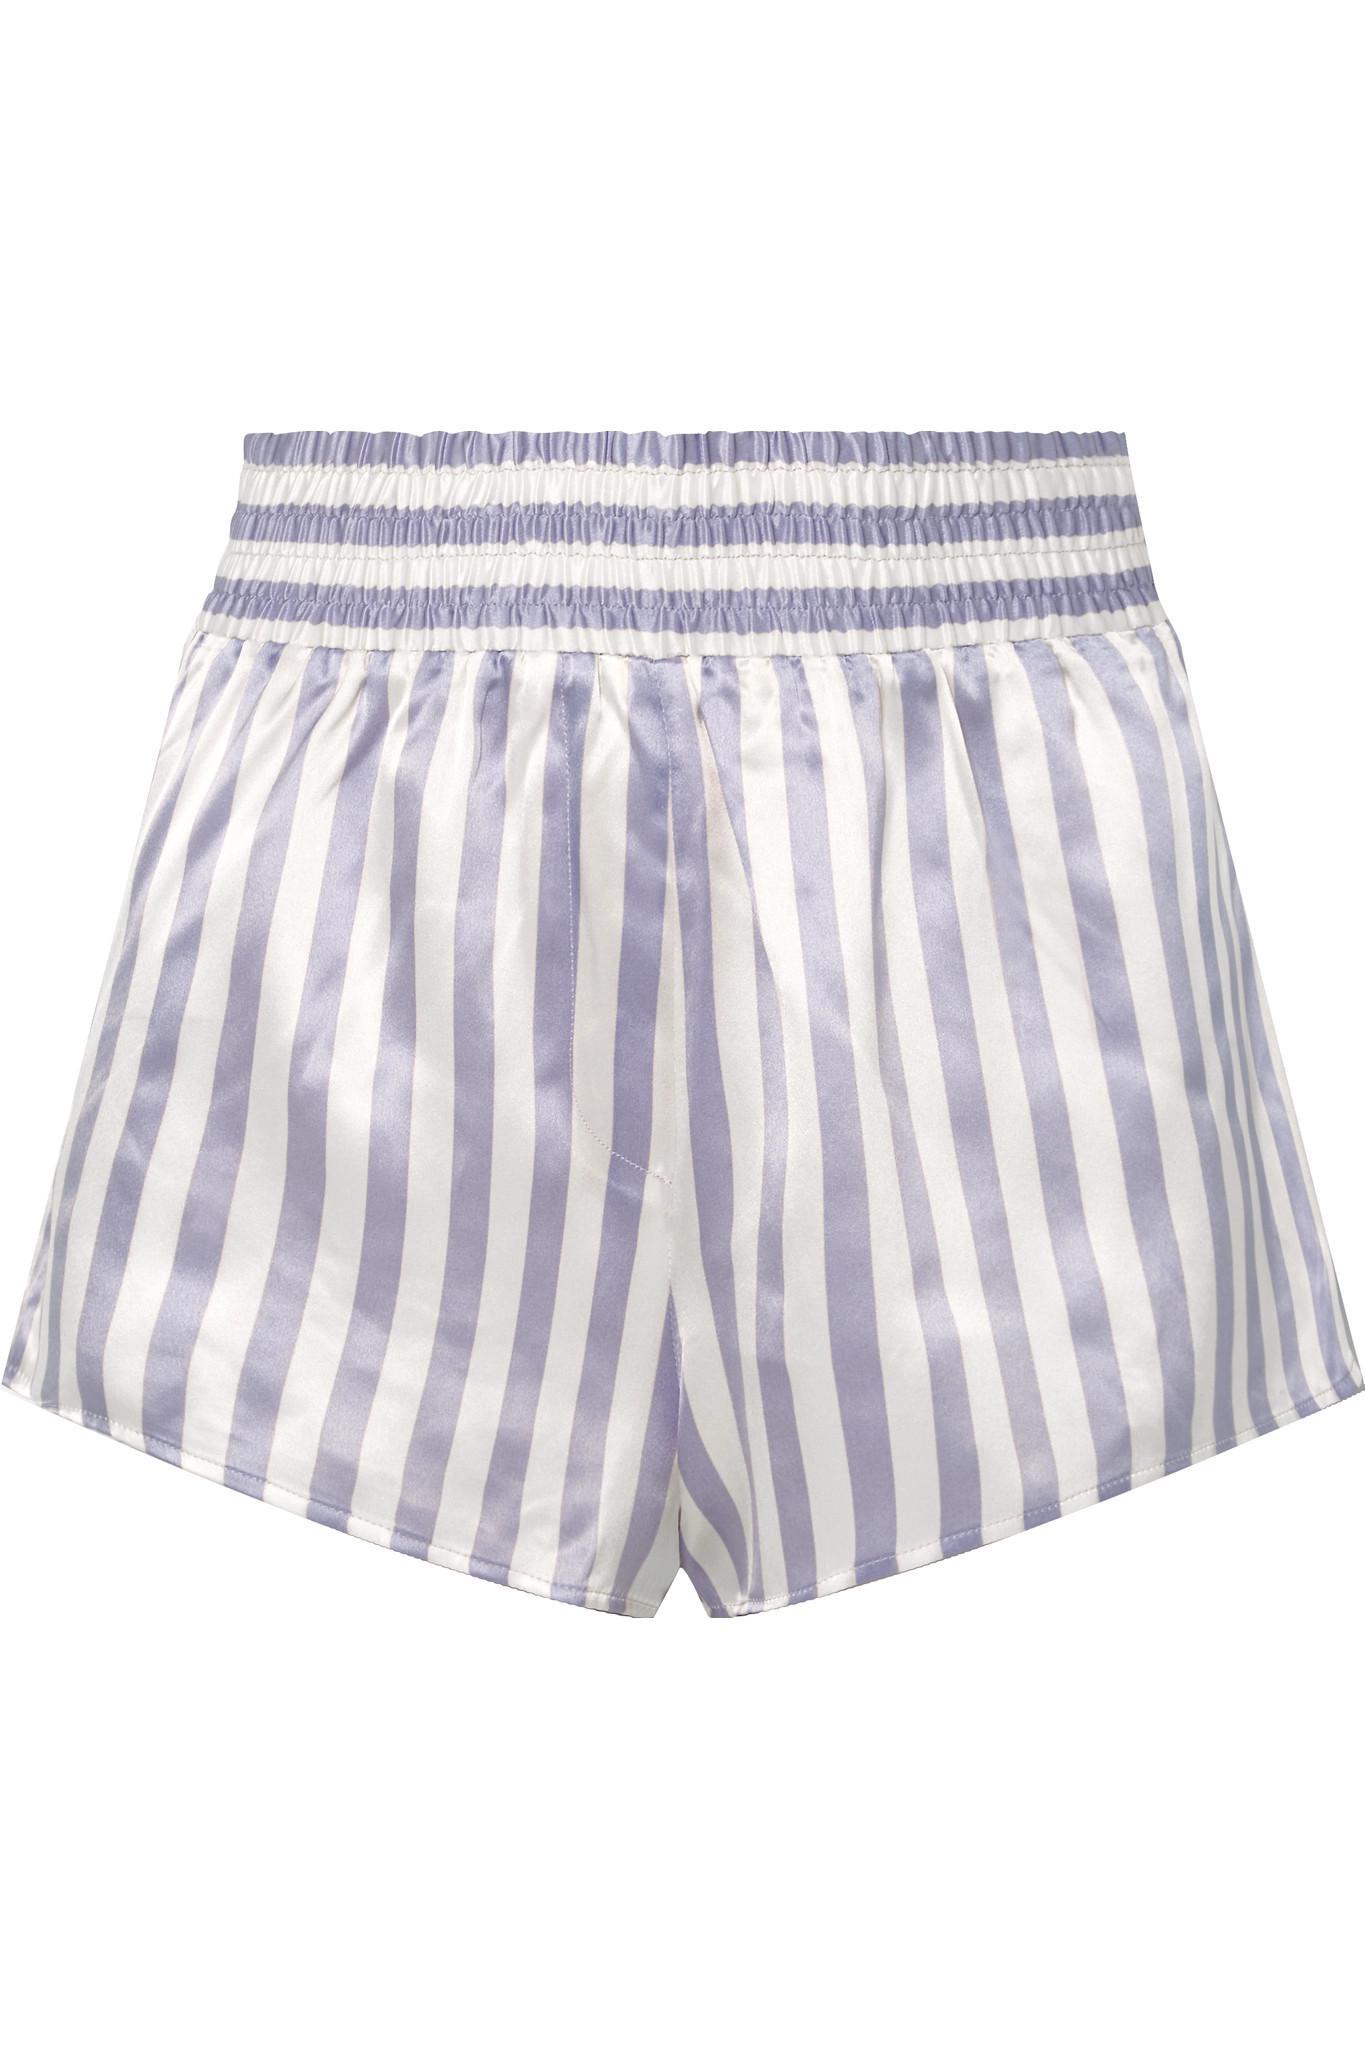 Morgan Lane. Women s Purple Amanda Fatherazi Corey Appliquéd Striped Silk-charmeuse  Pyjama Shorts 61b0dd1fe